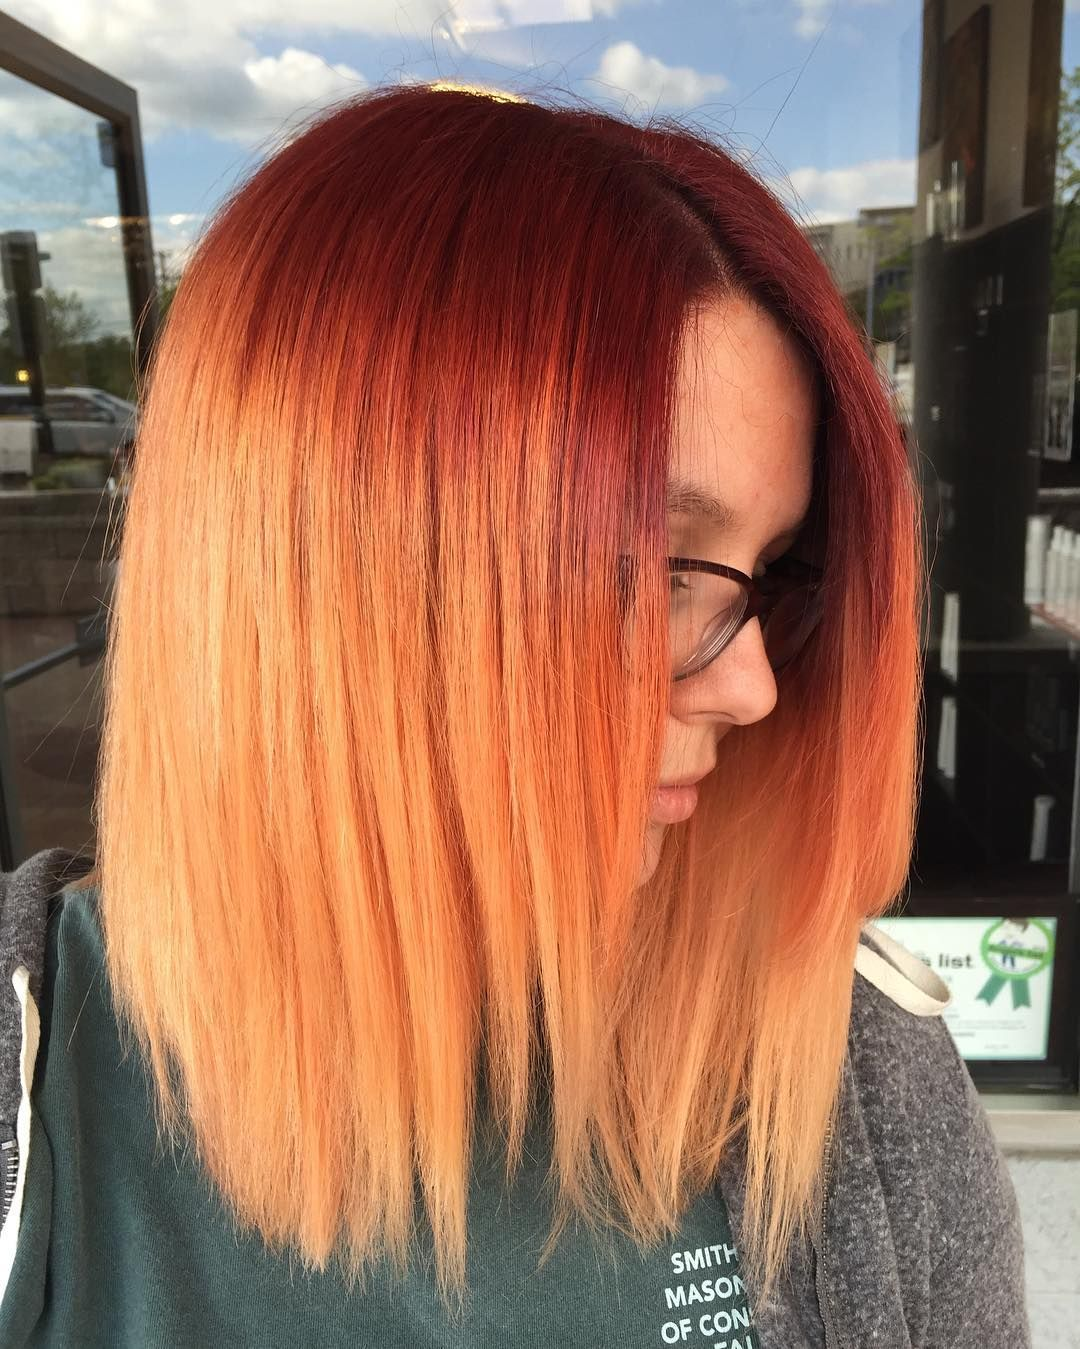 50 Best Red Hair Color Ideas — Violet, Deep Dark, Burgundy